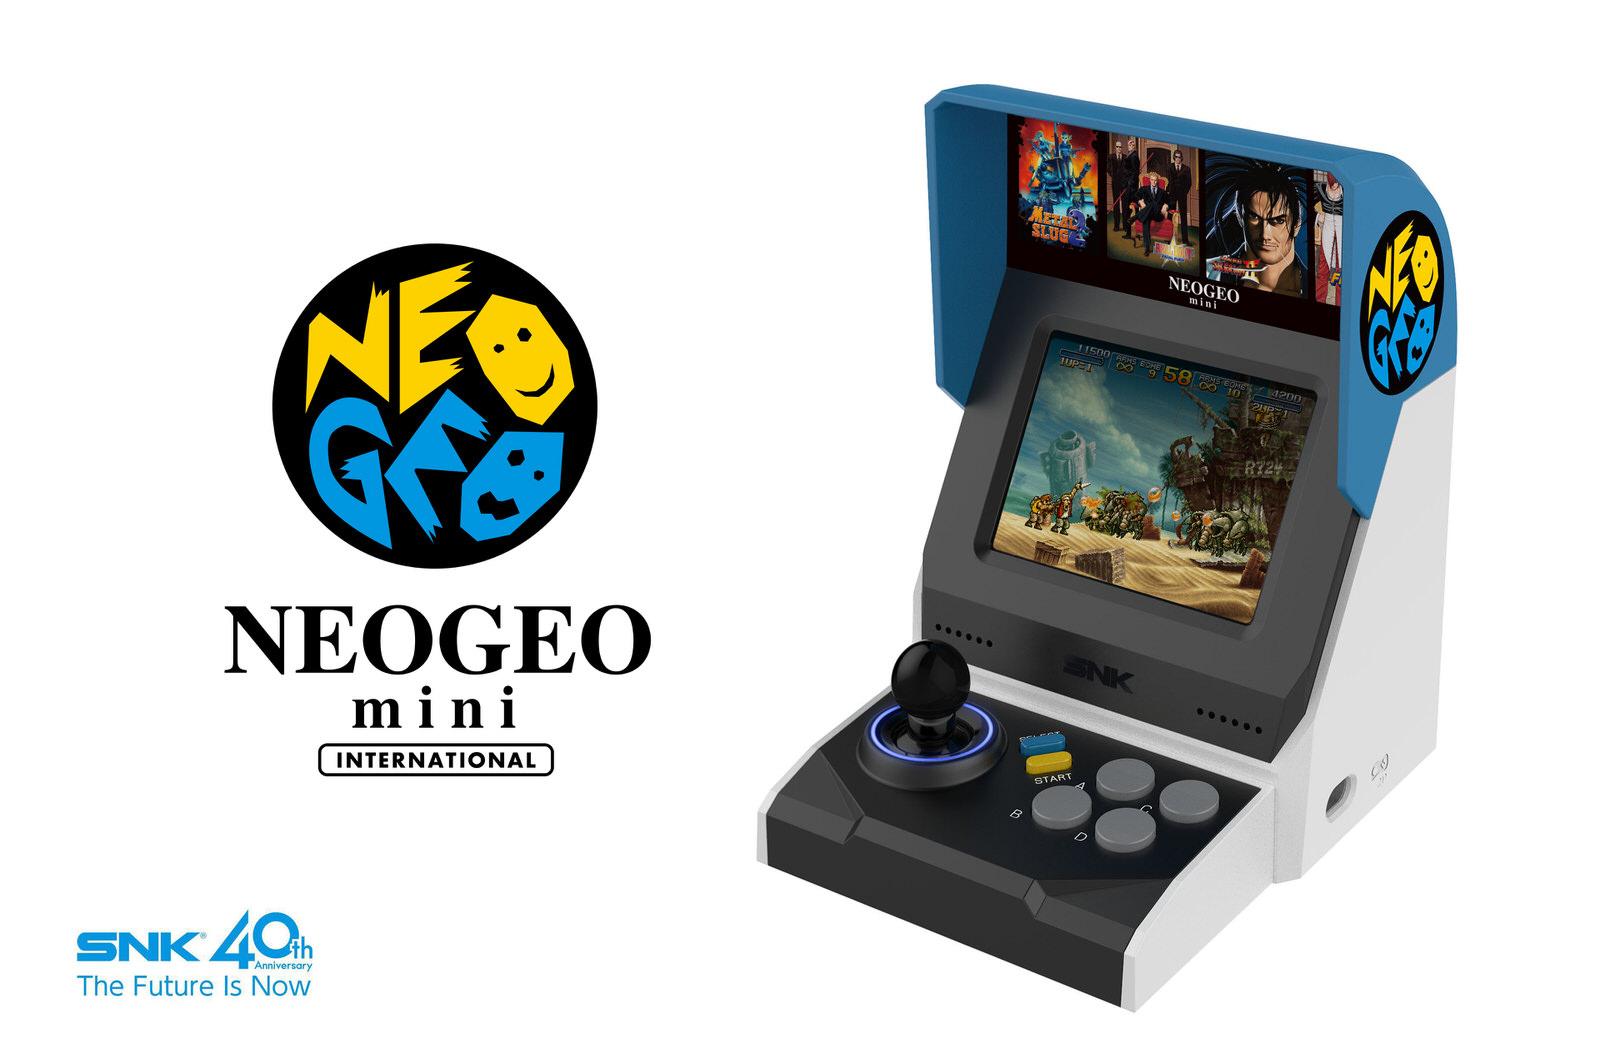 「NEOGEO mini」を正式発表、名作・傑作タイトルを40作内蔵 3.5インチディスプレイも搭載